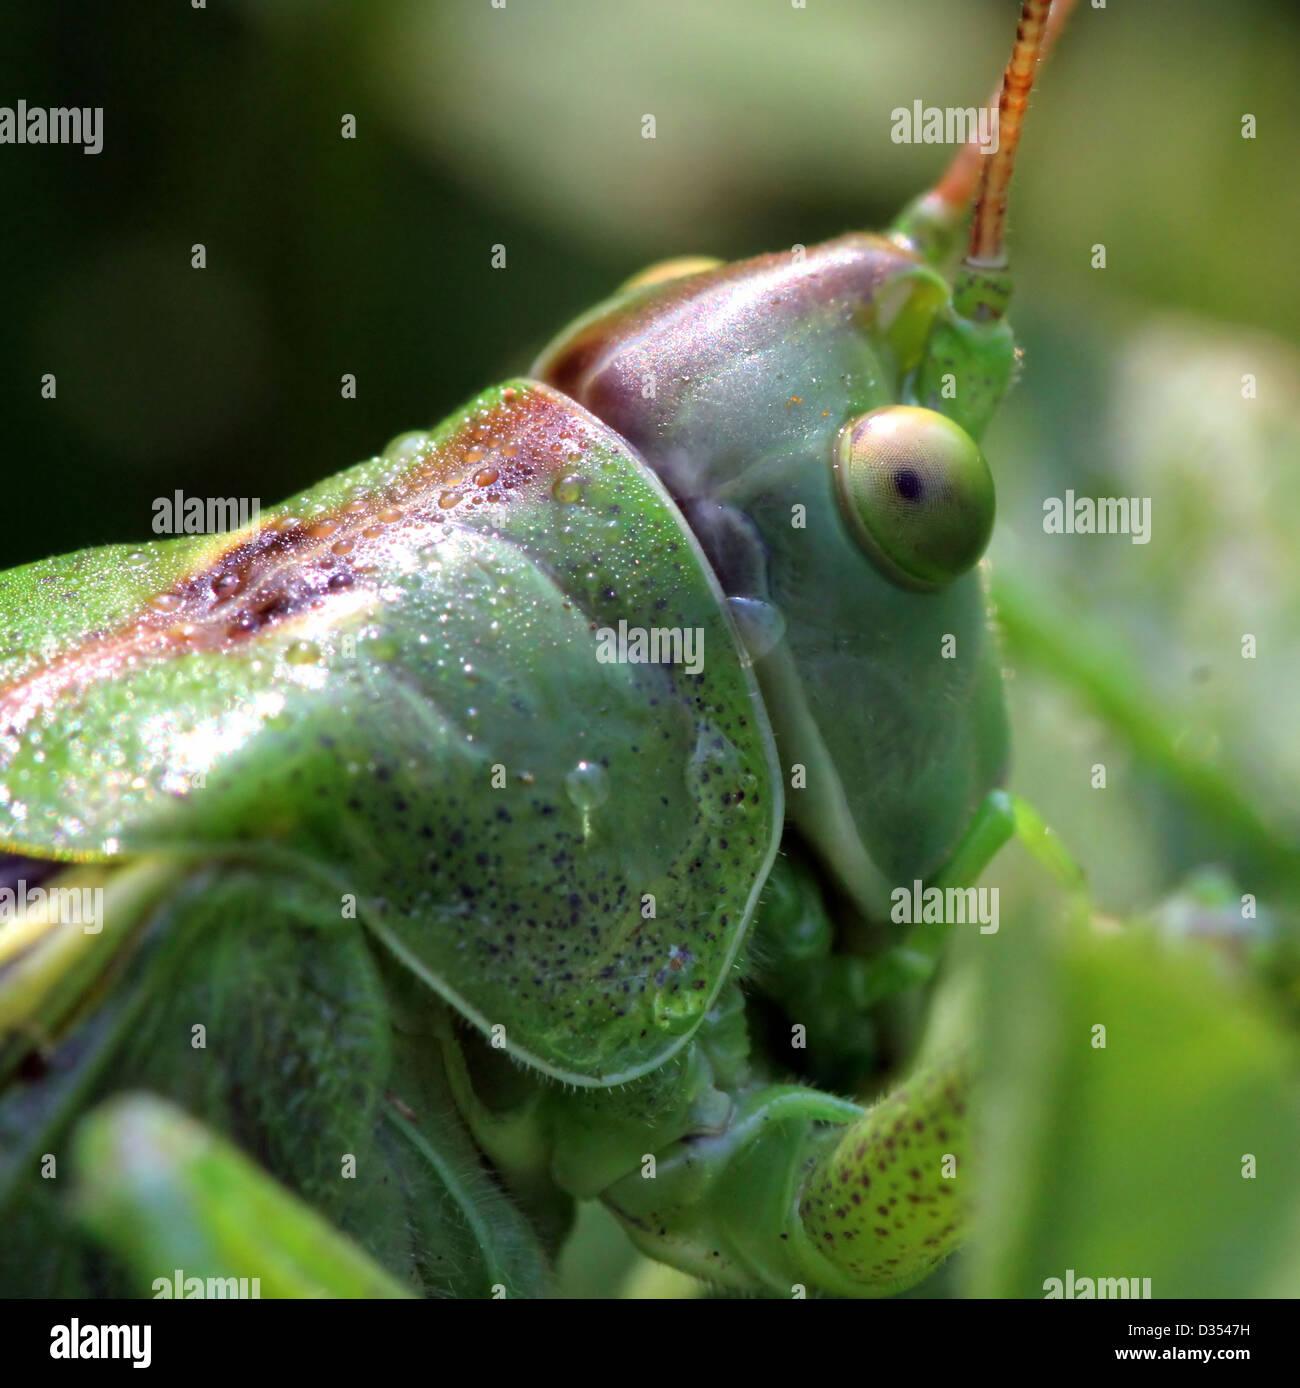 Extreme Makroaufnahme des Kopfes einer großen Green Bush Grille (Tettigonia Viridissima) Stockbild